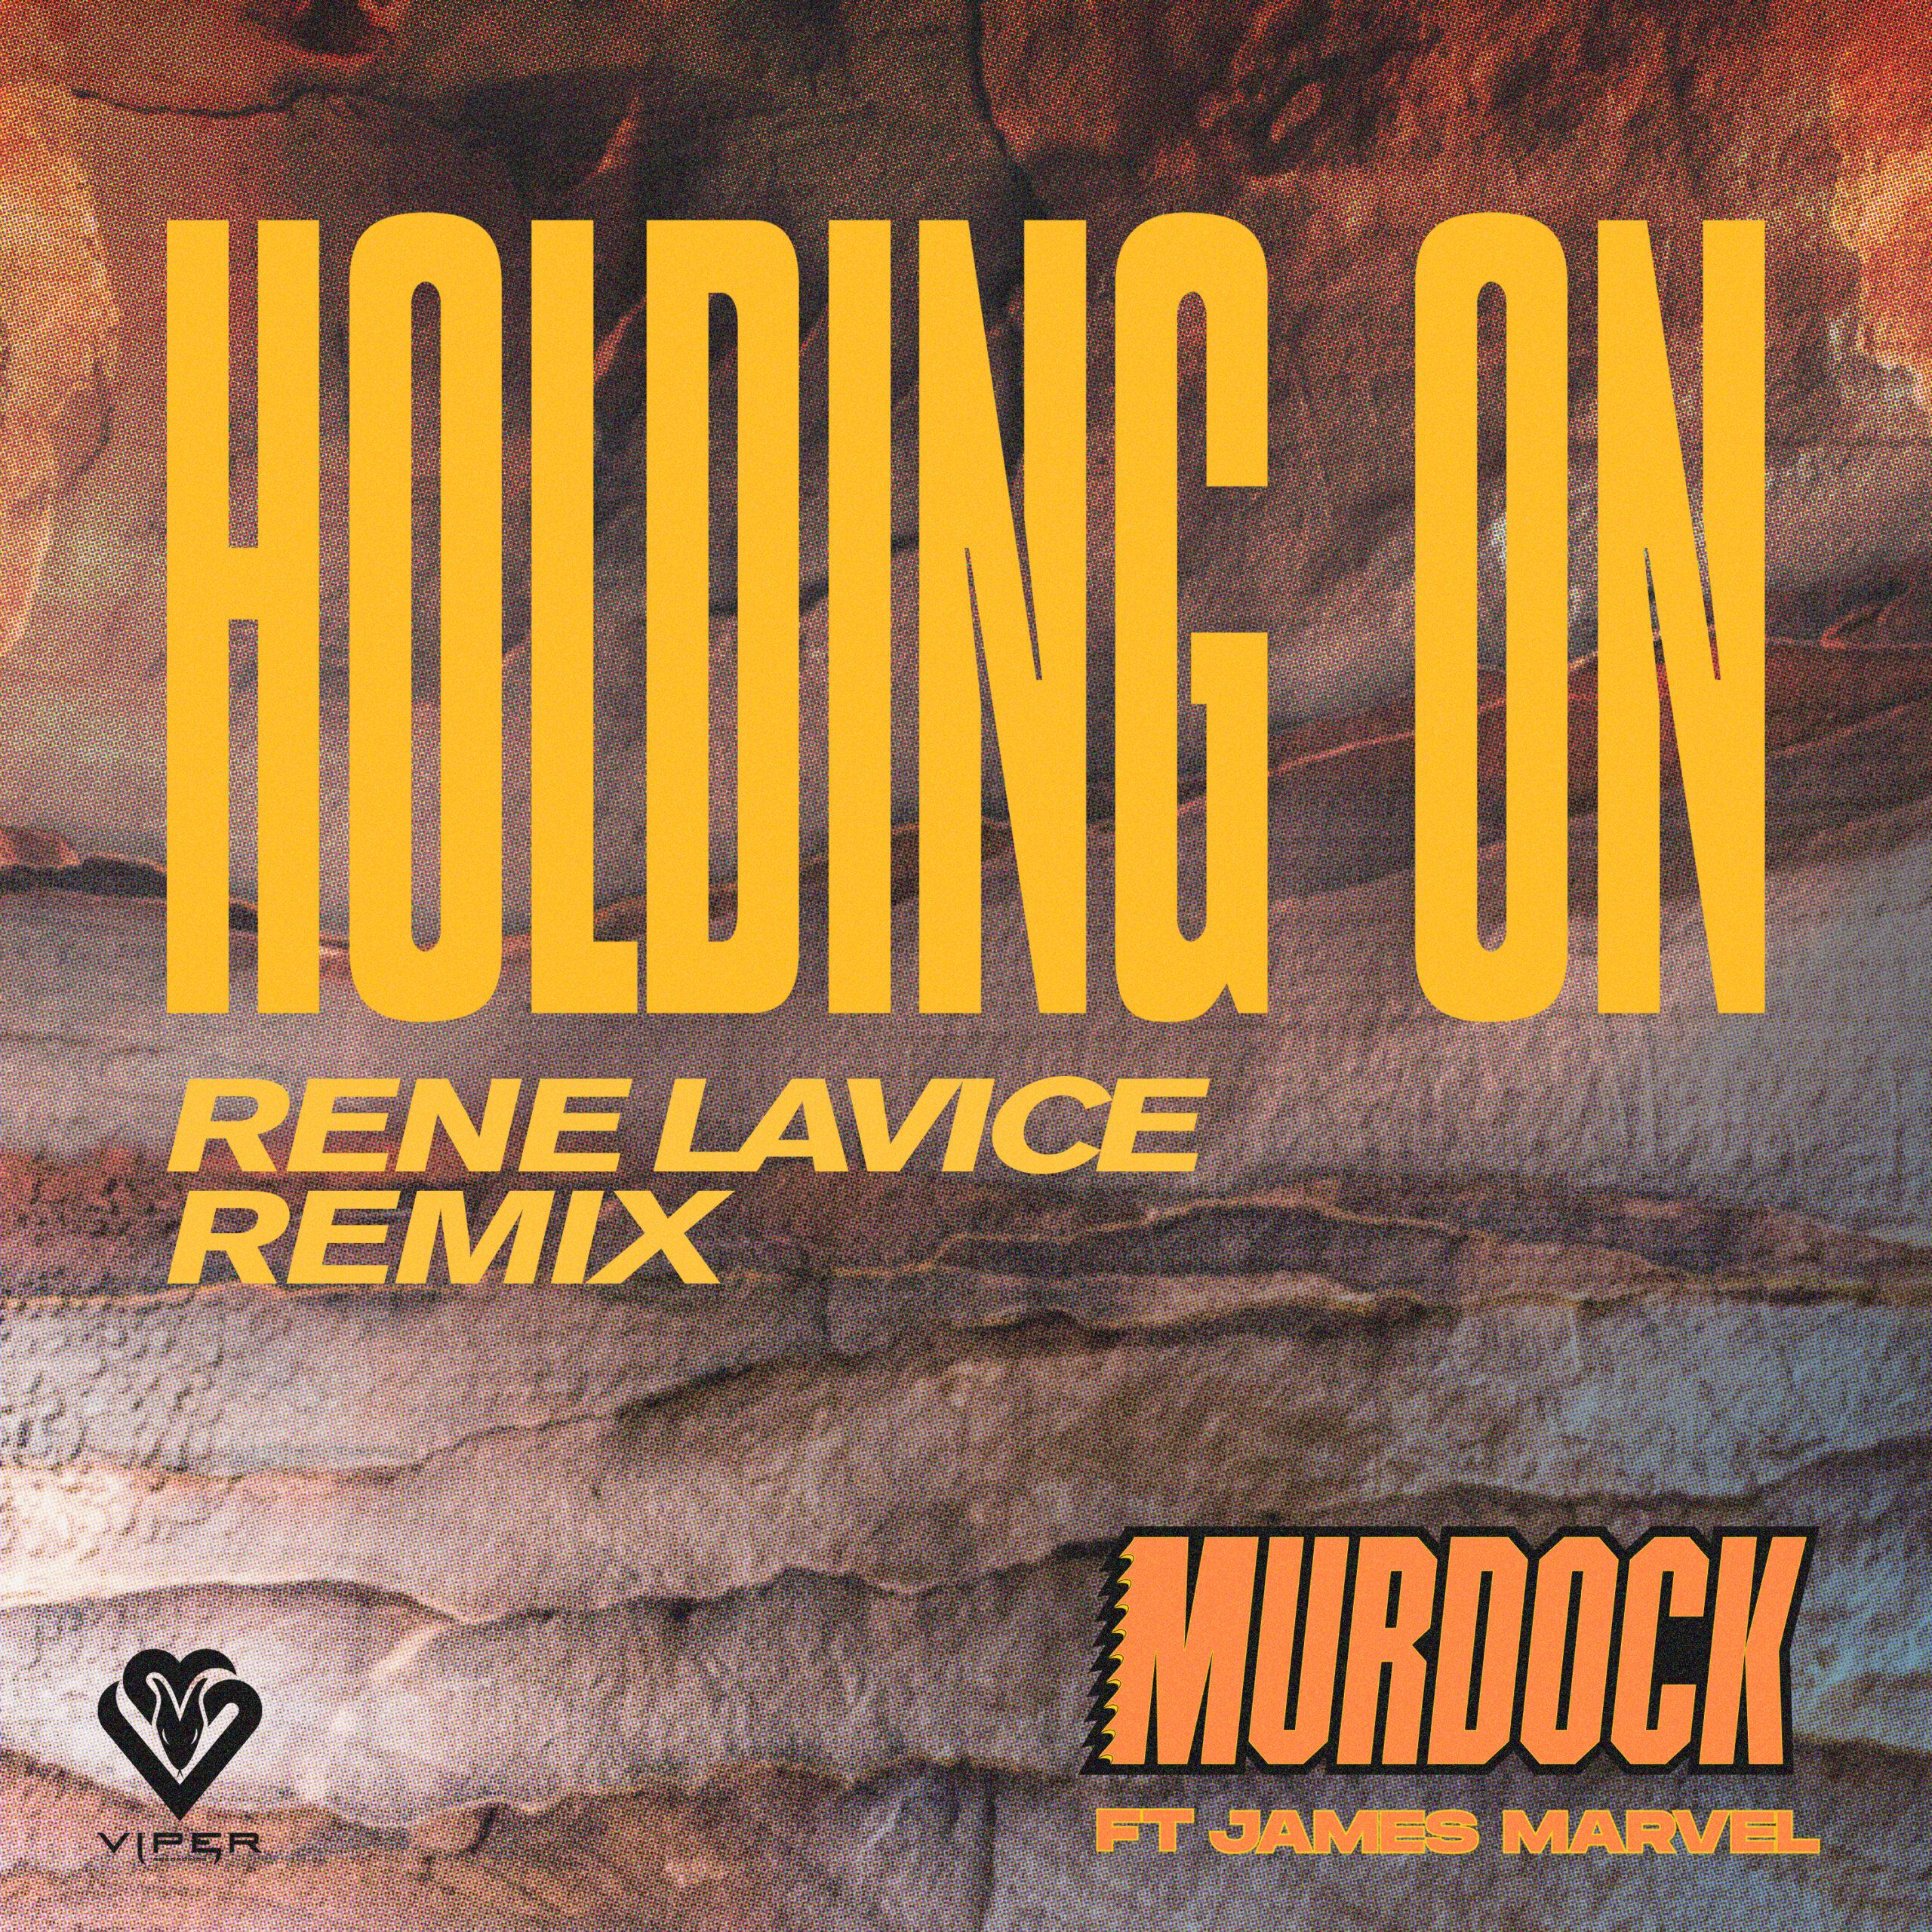 Murdock ft. James Marvel - Holding On (Rene LaVice Remix) [VPR221]